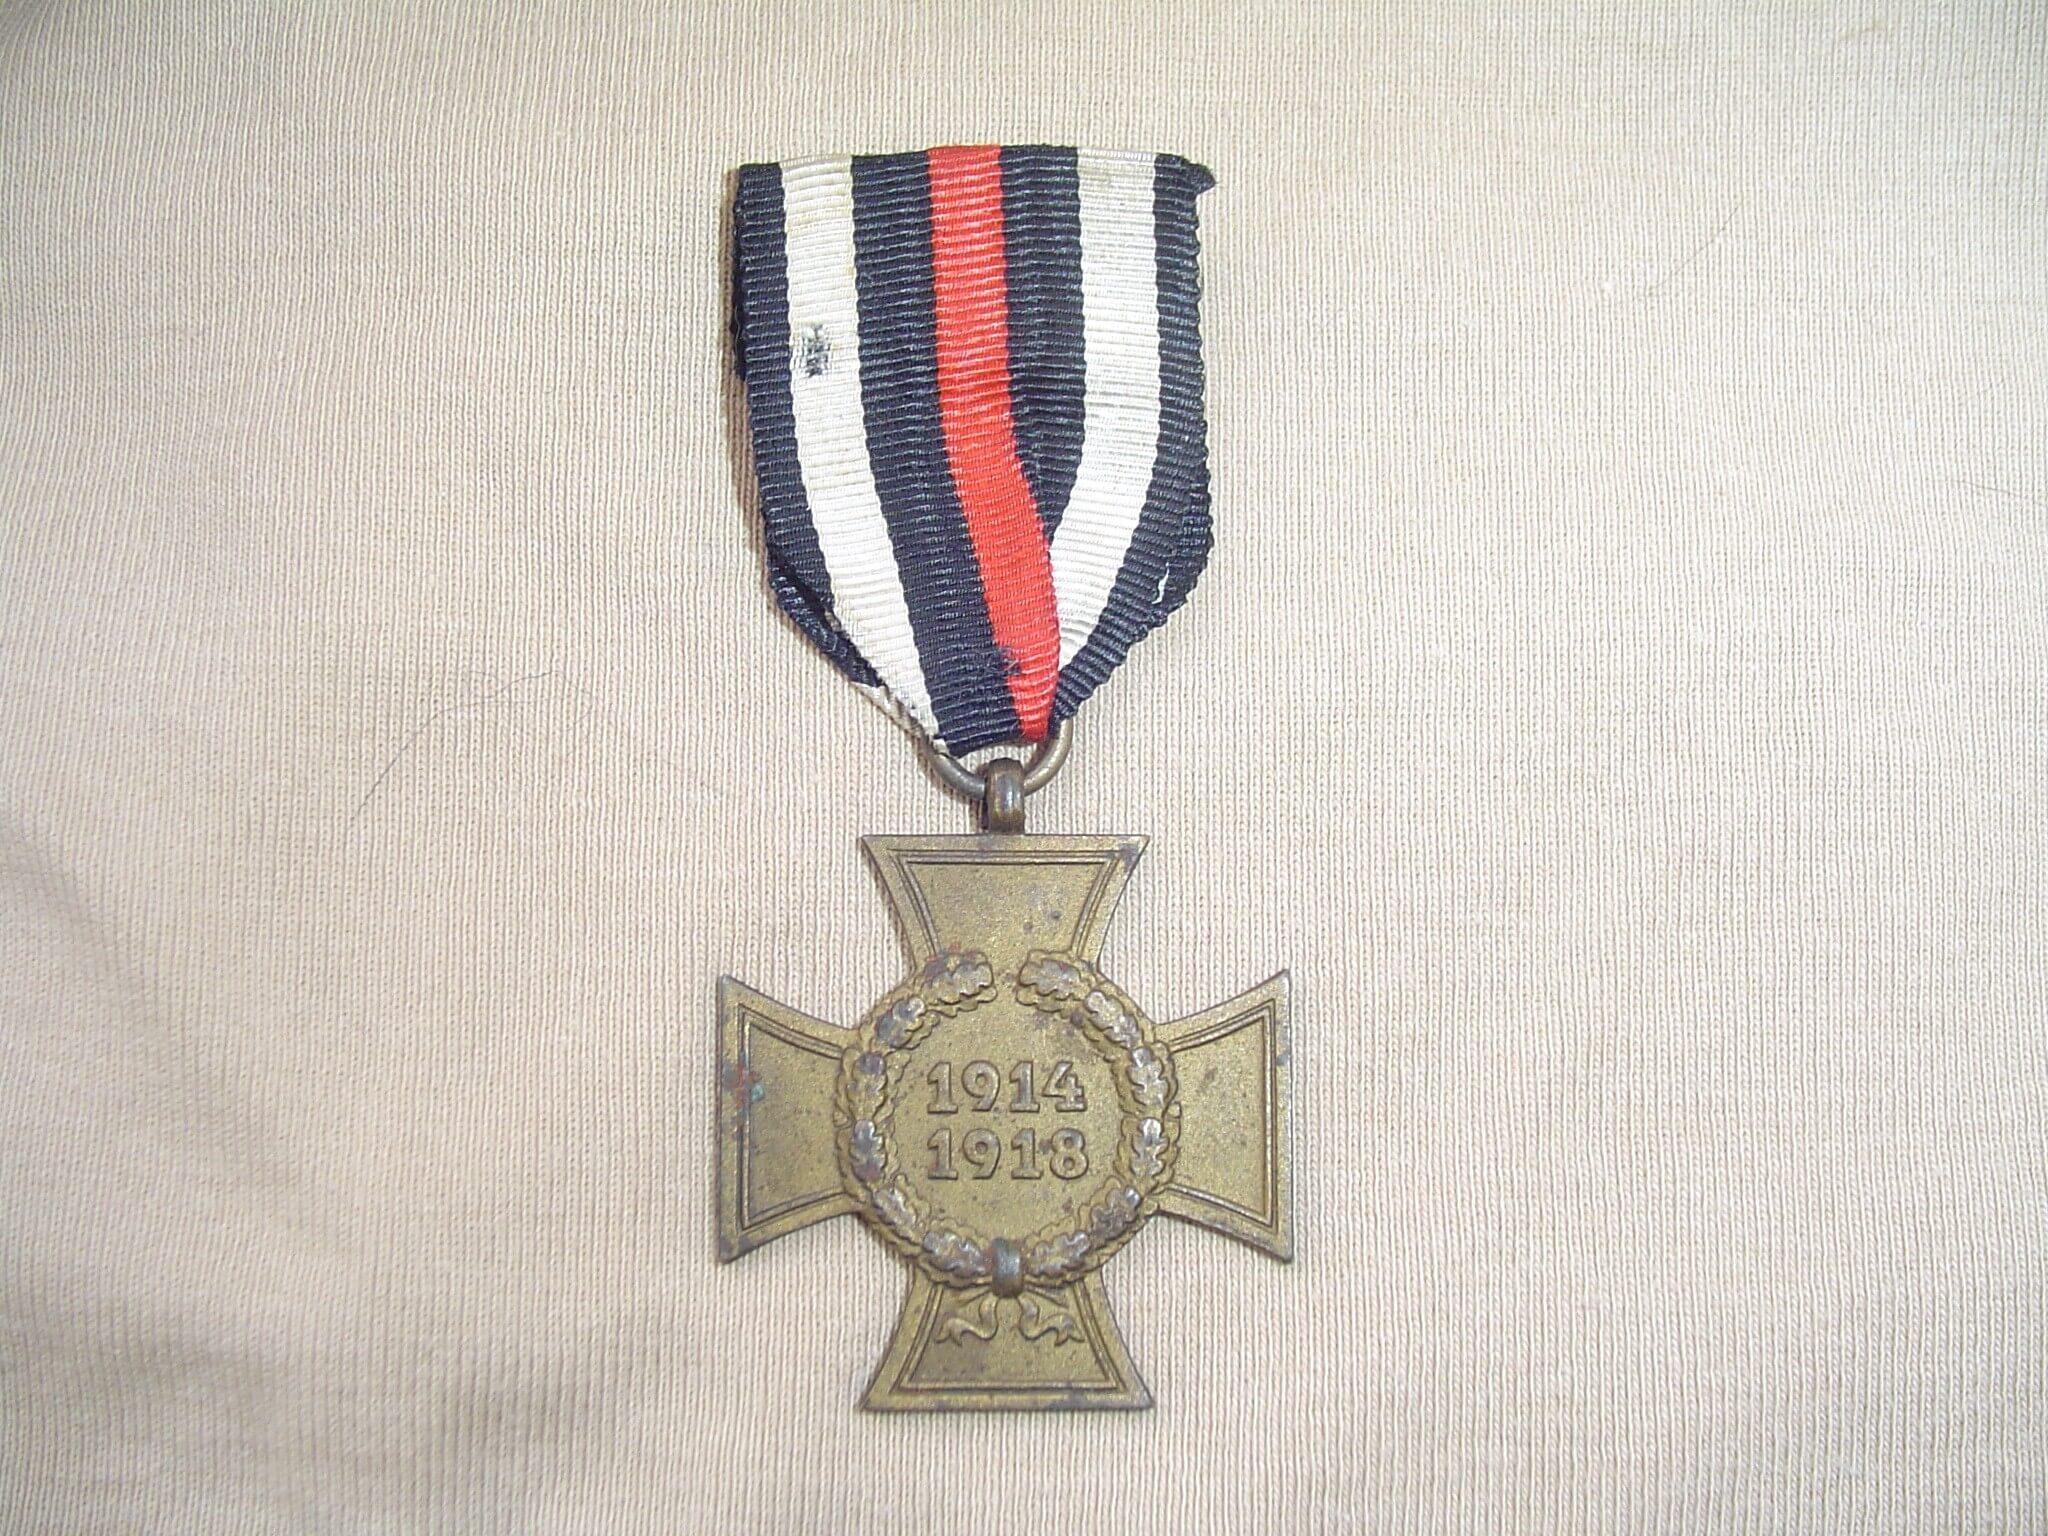 Duitse frontkampfer kruis